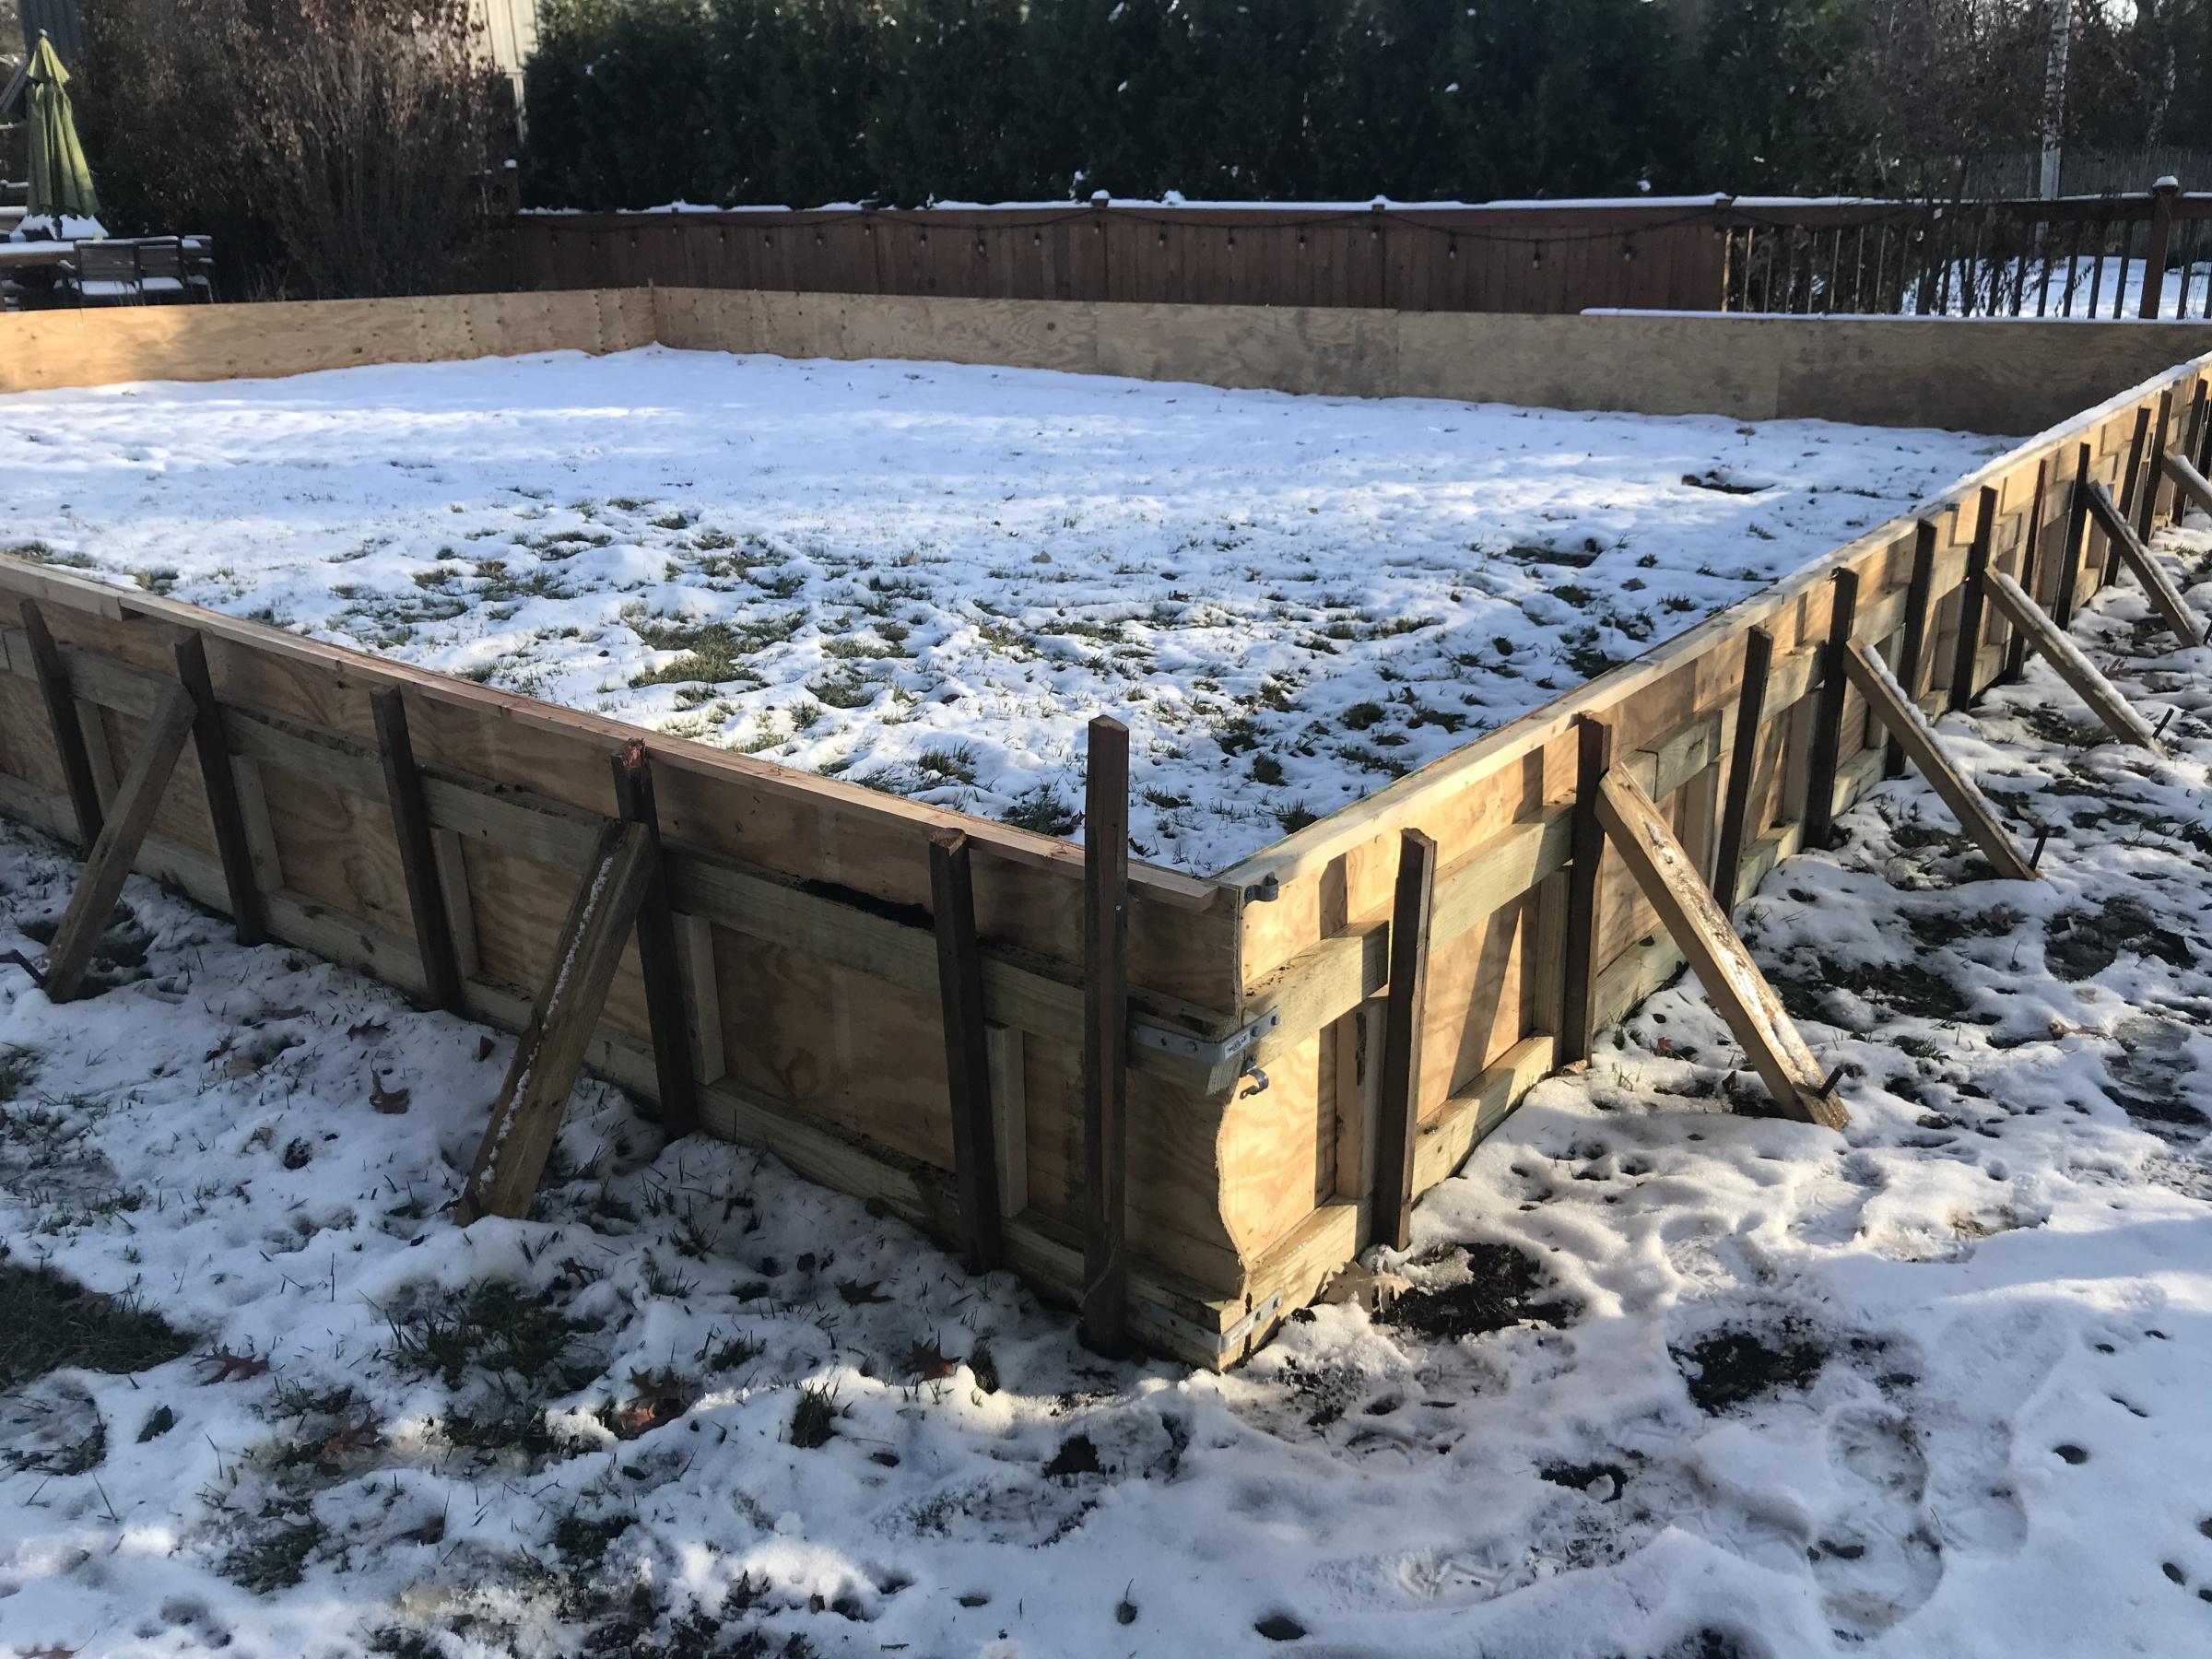 Backyard Hockey Rink Year 2 - Project Showcase - DIY ...